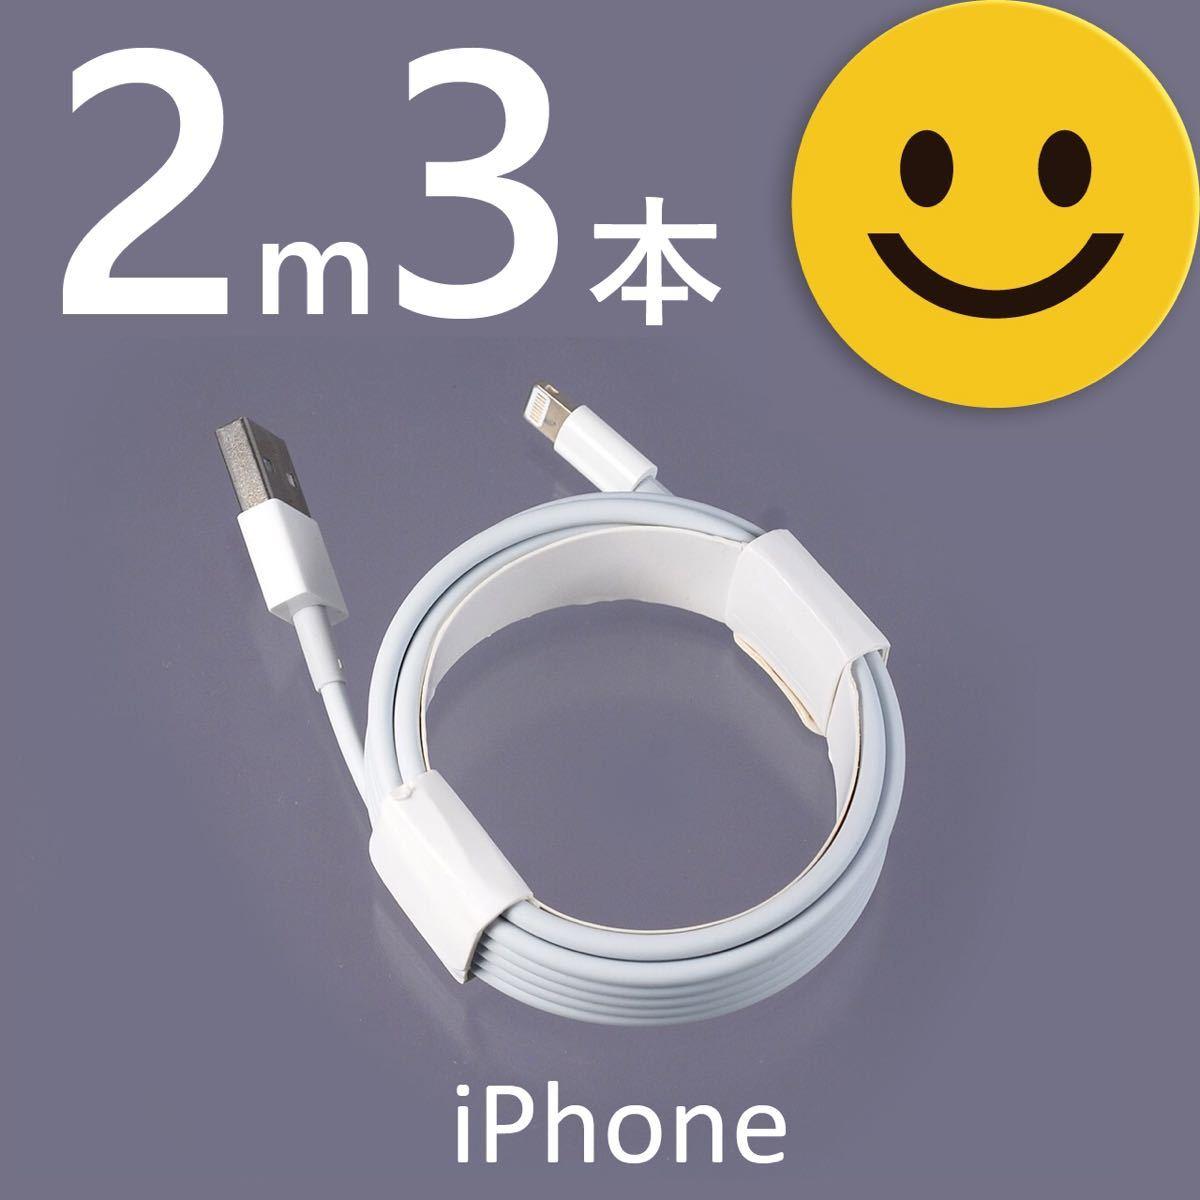 iPhone 充電器 充電ケーブル コード lightning cable データ転送 高速充電 USB 急速充電